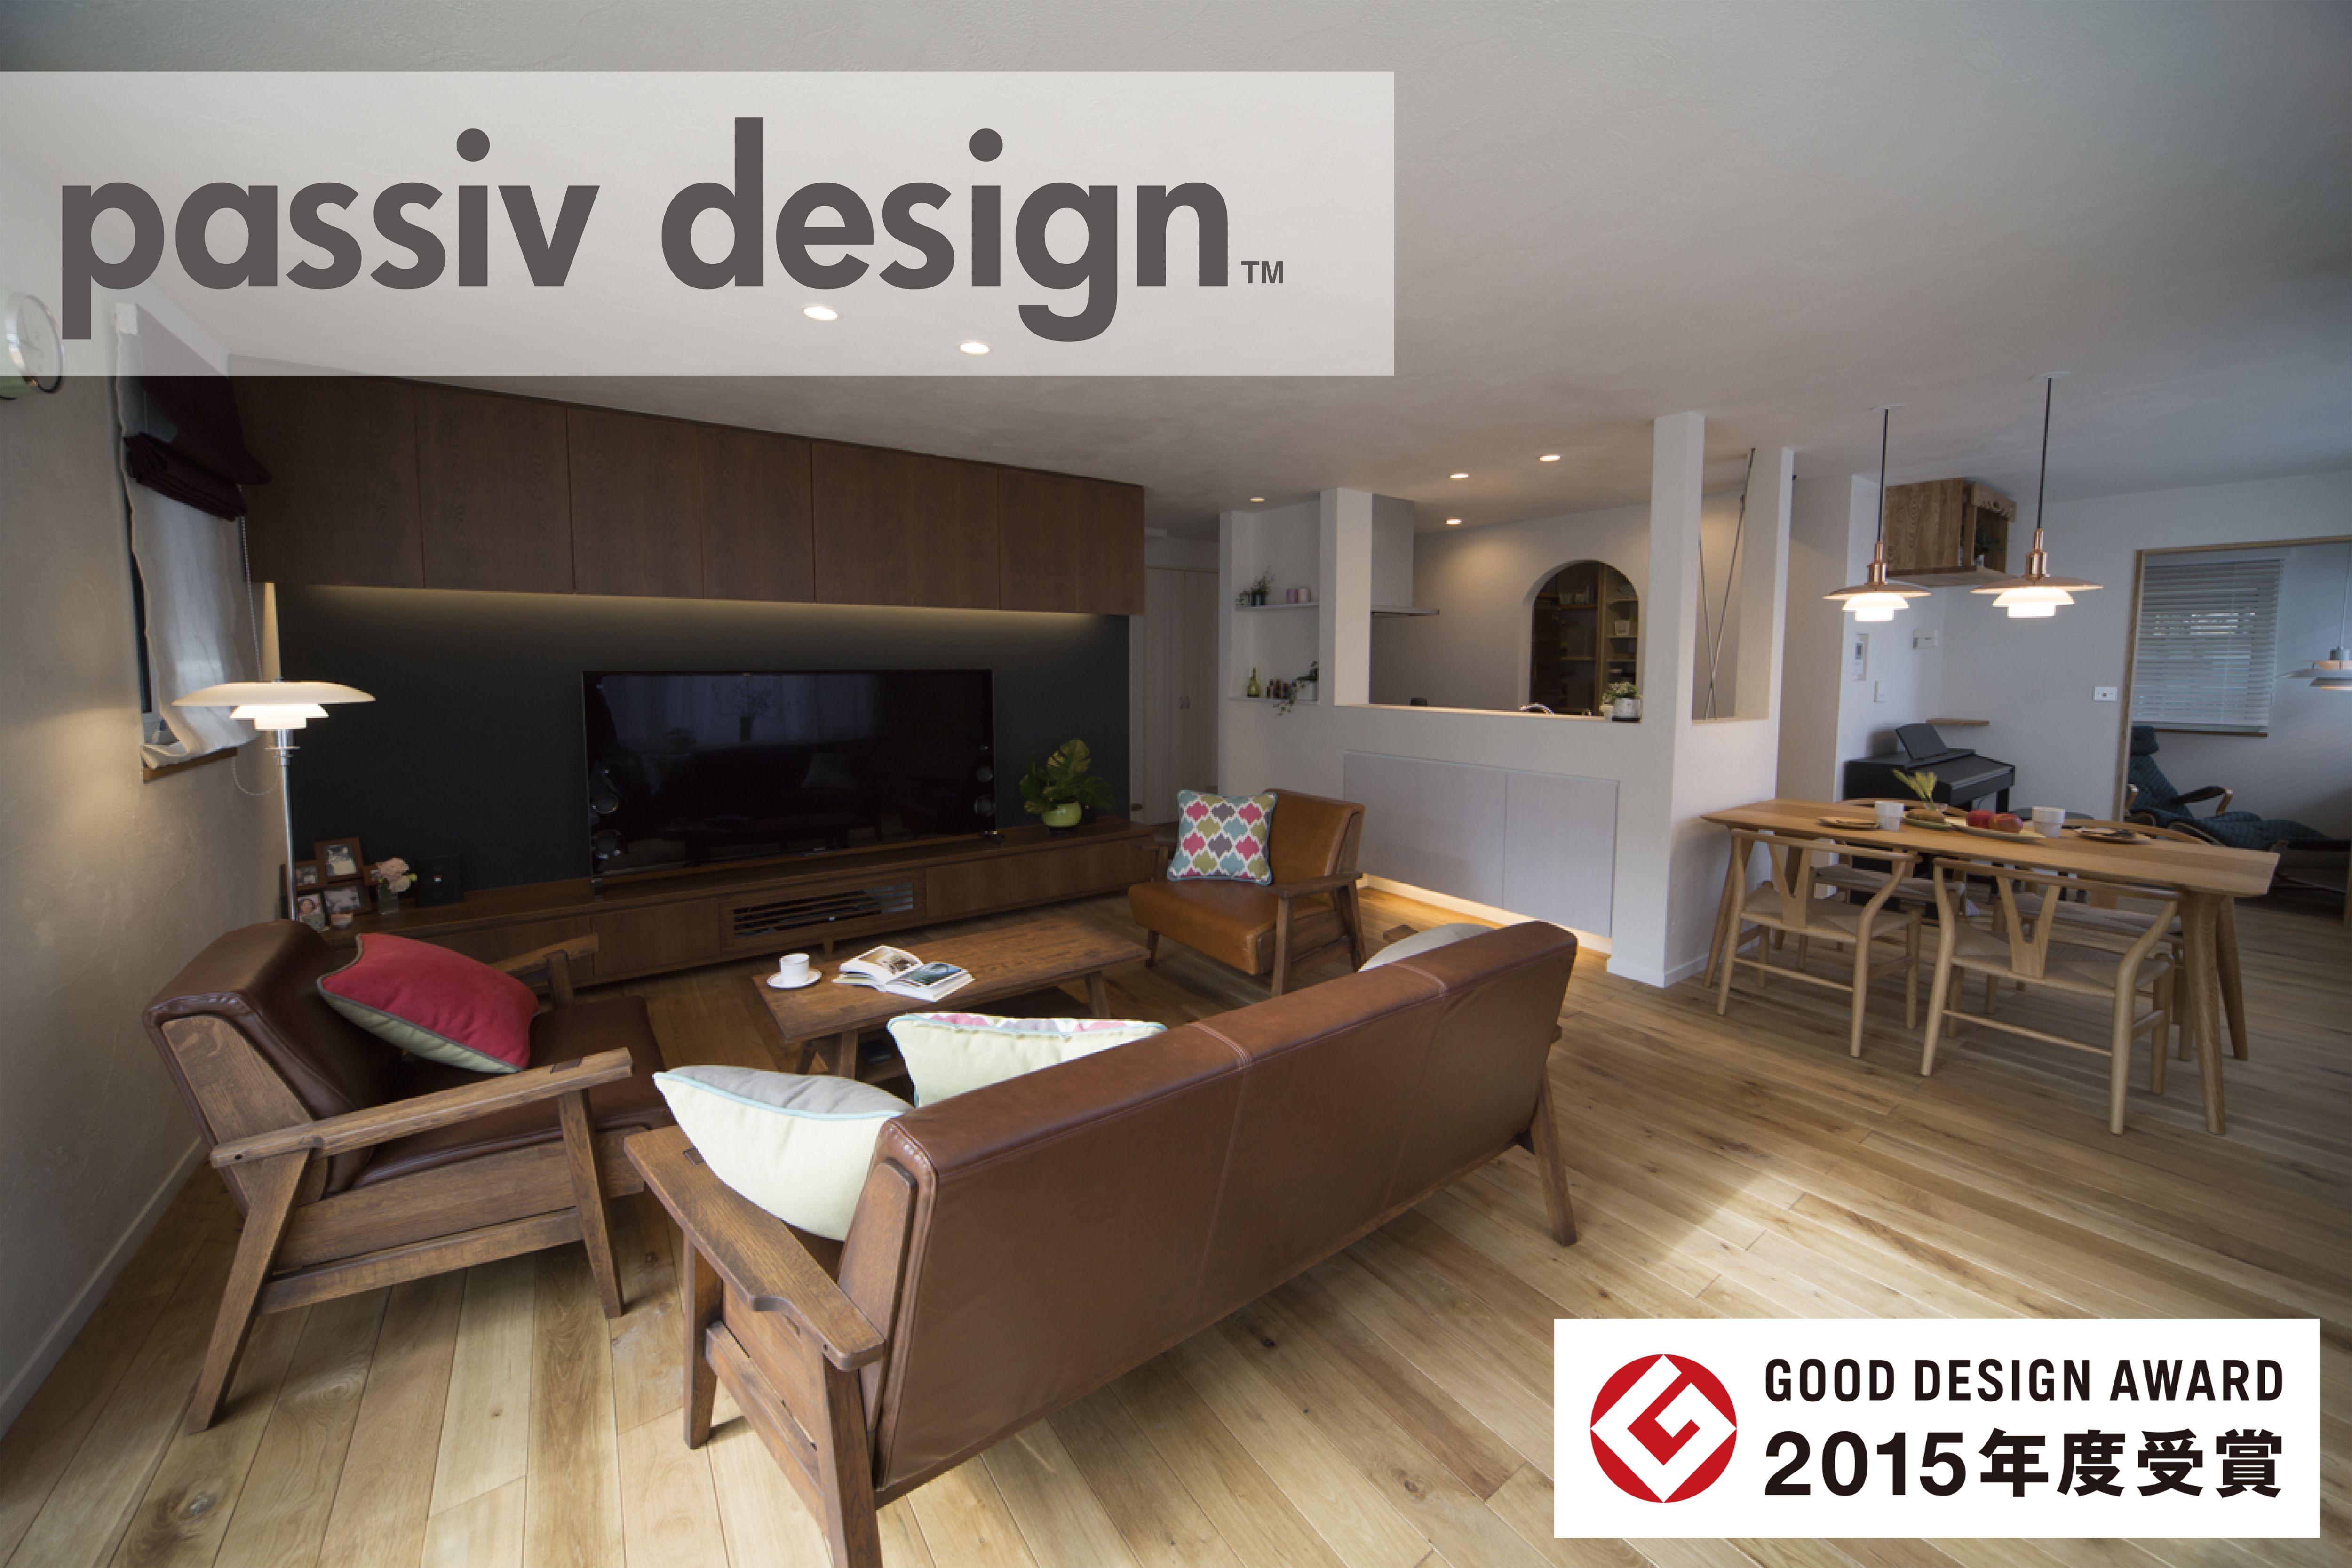 okutaの住宅ブランドpassiv designが 2015年度 グッドデザイン賞 を